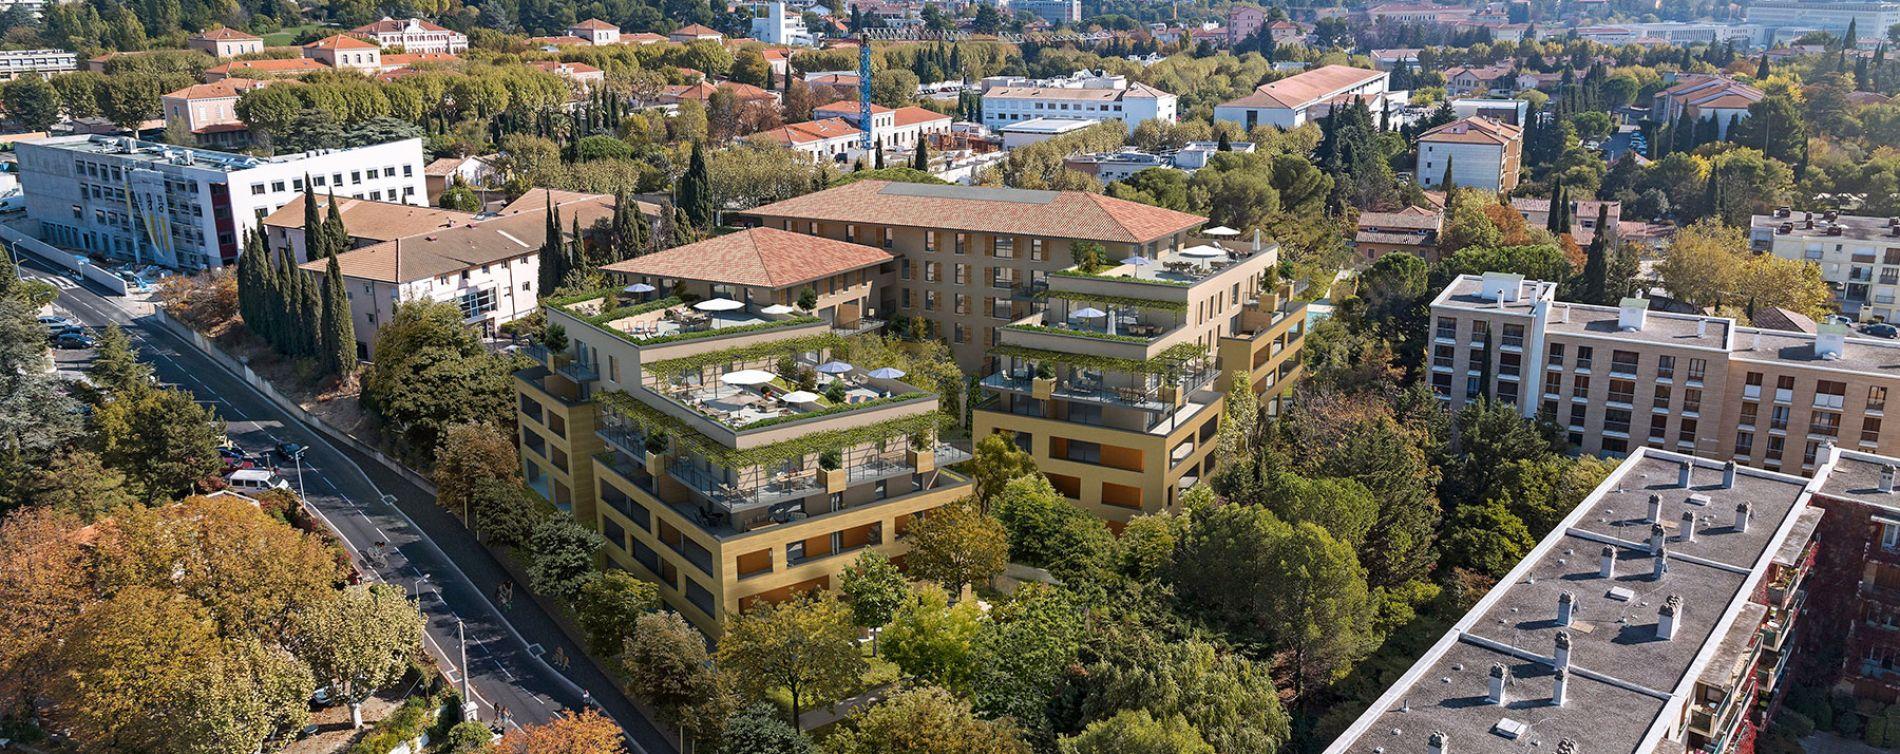 Résidence Aixcellence à Aix-en-Provence